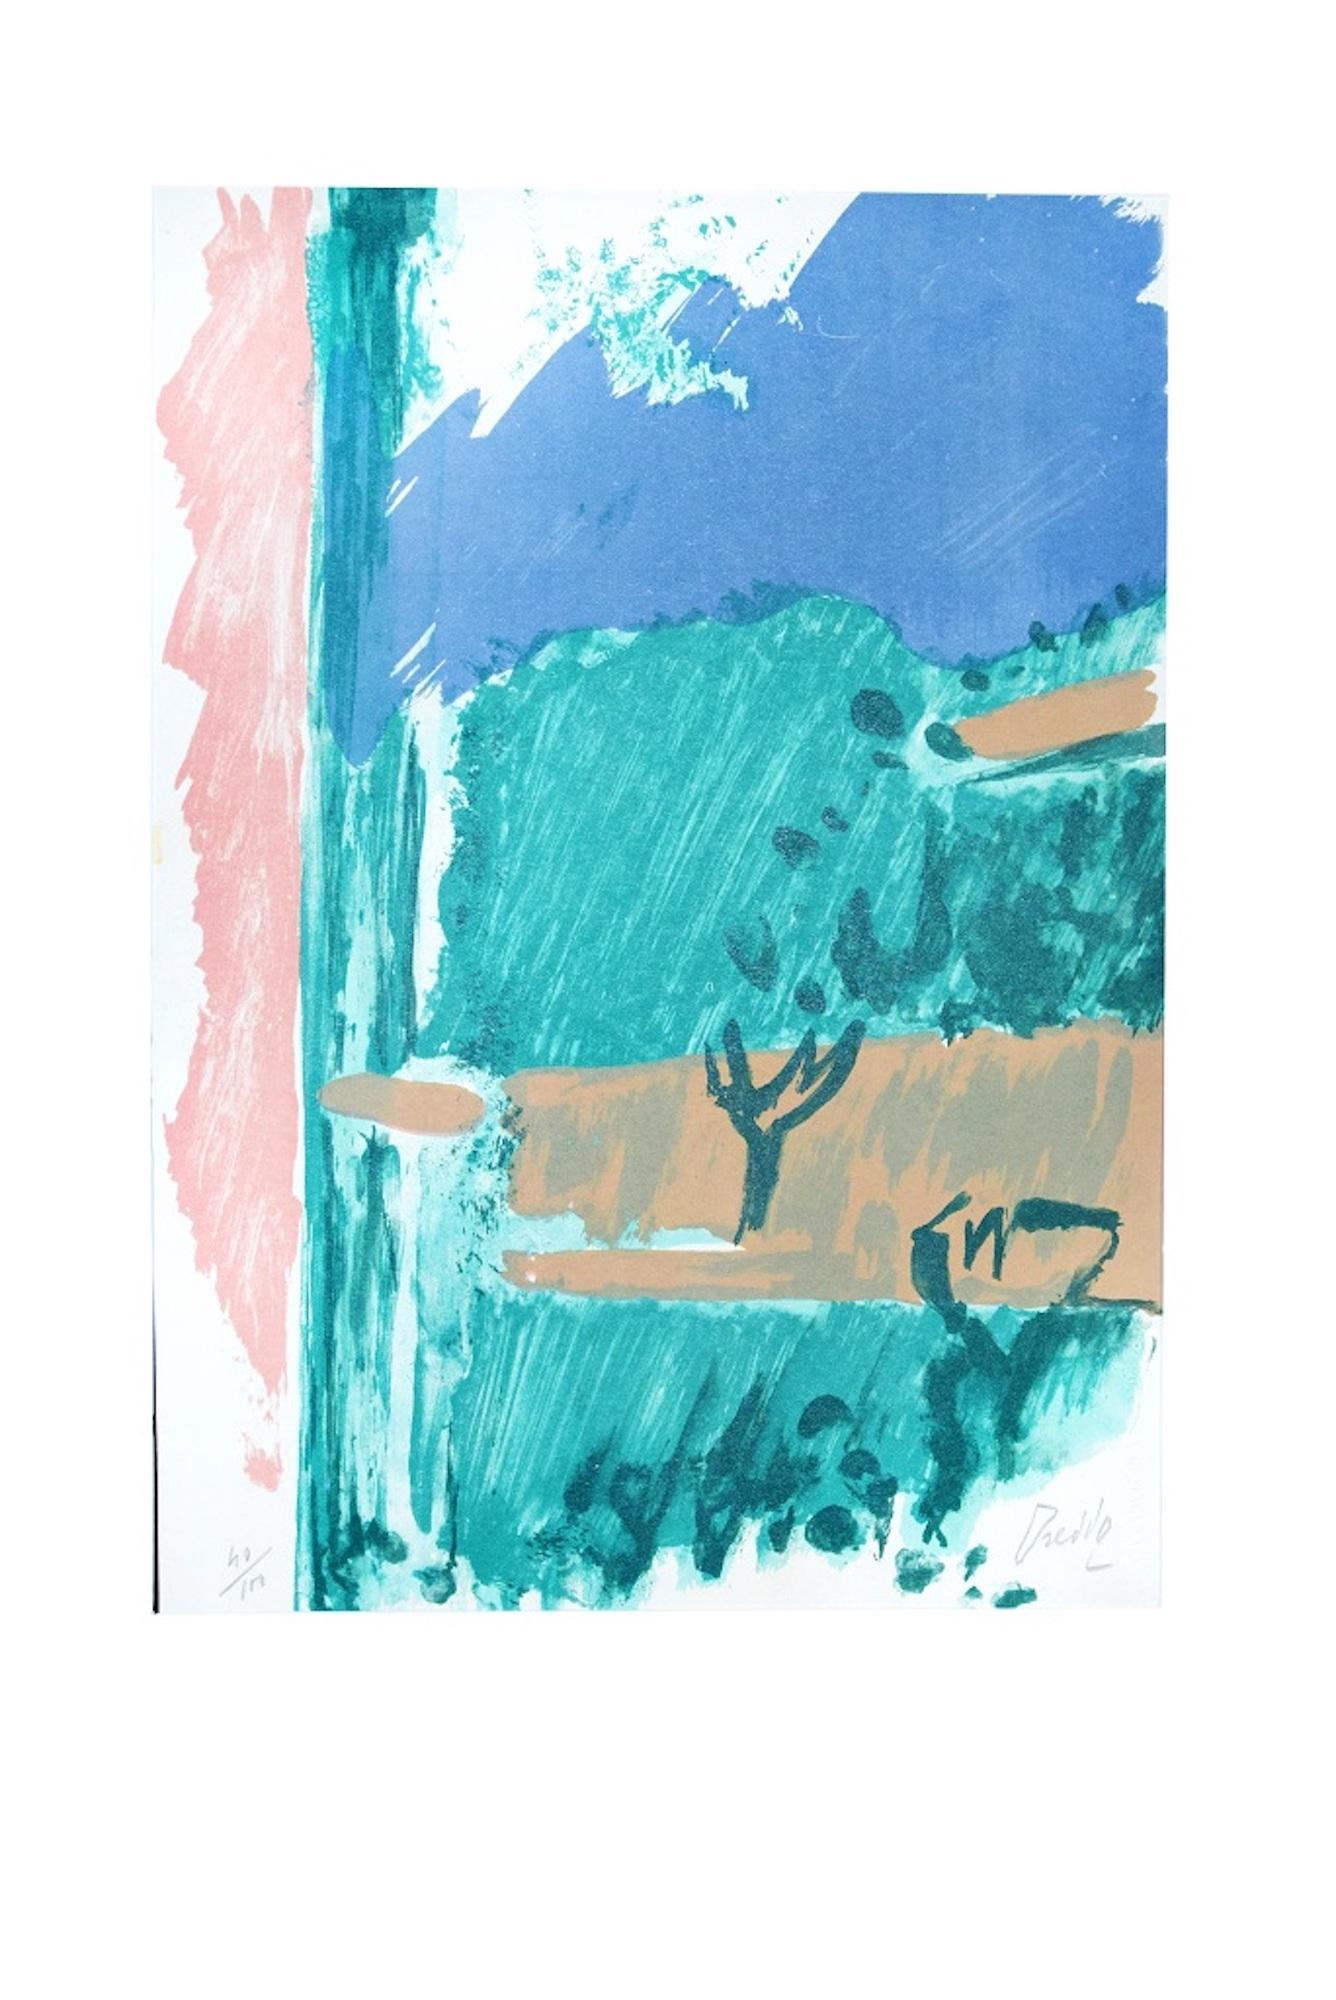 From the Window - Original Lithograph by Gastone Breddo - 1970s